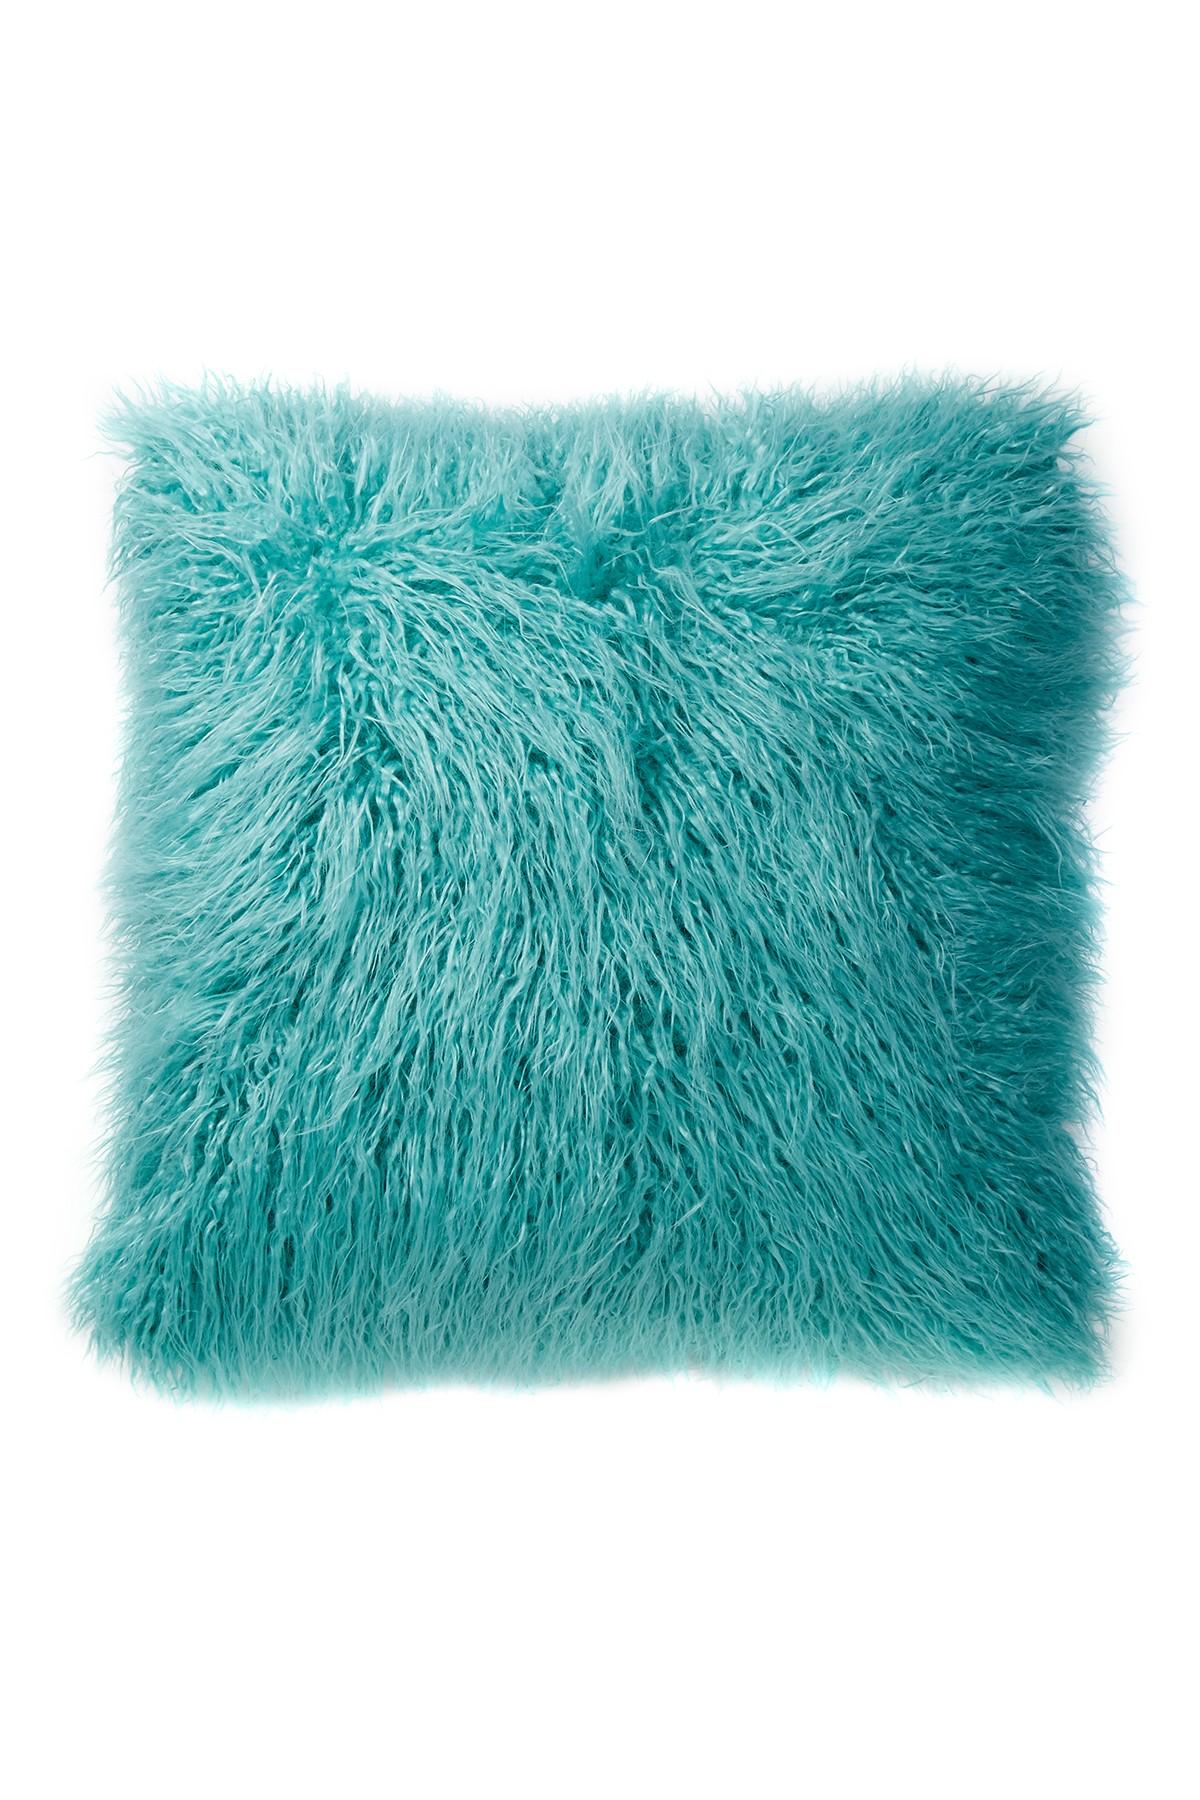 Flokati Pillow